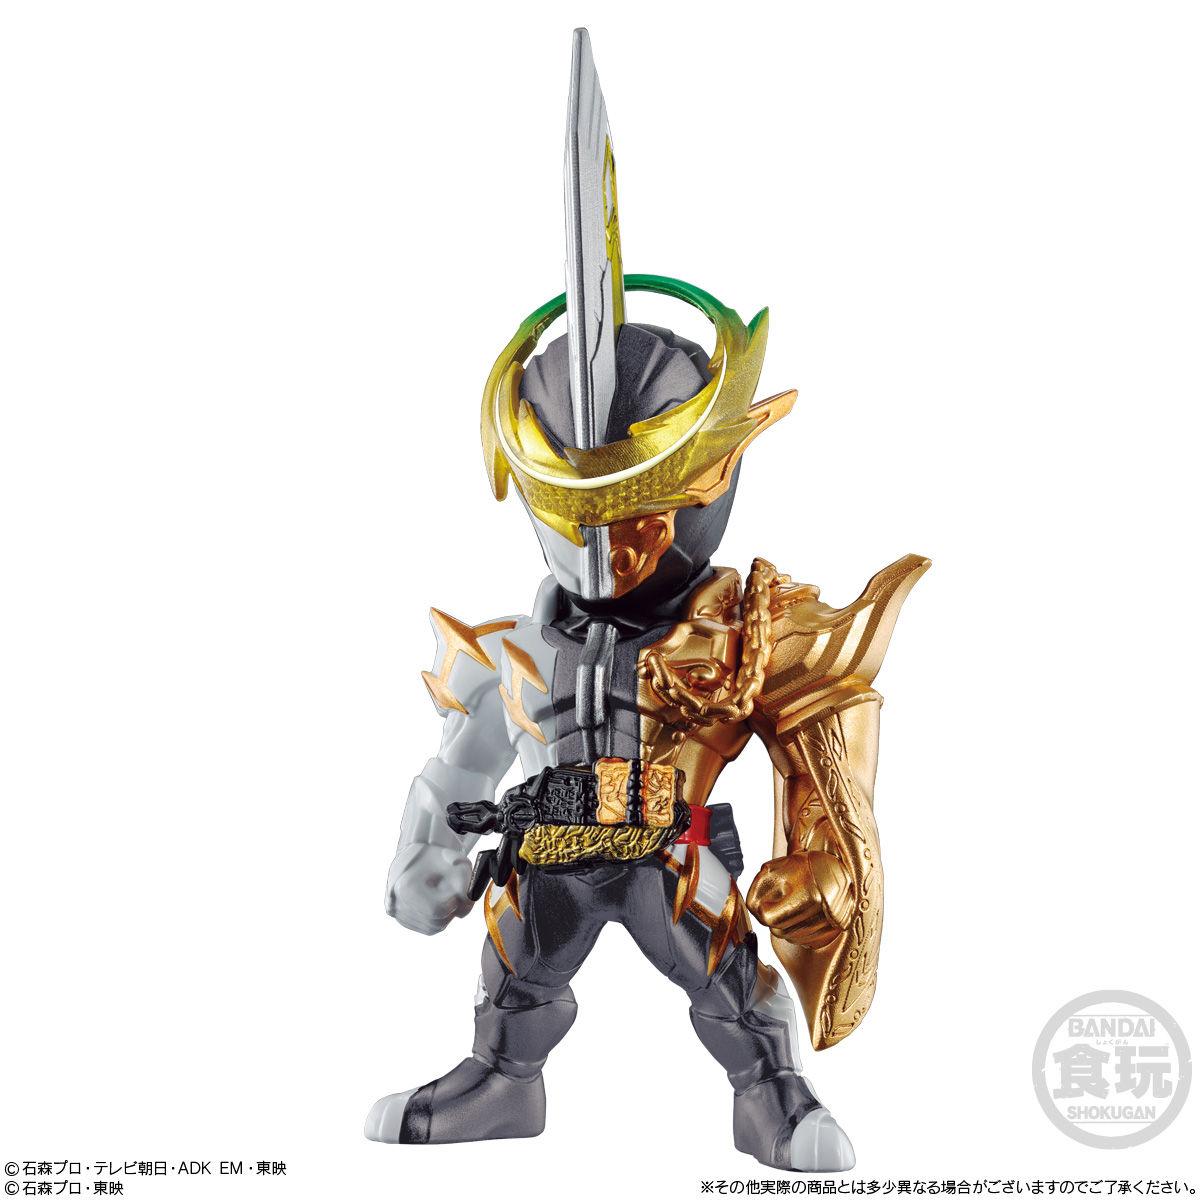 CONVERGE KAMEN RIDER 21: Kamen Rider Souther